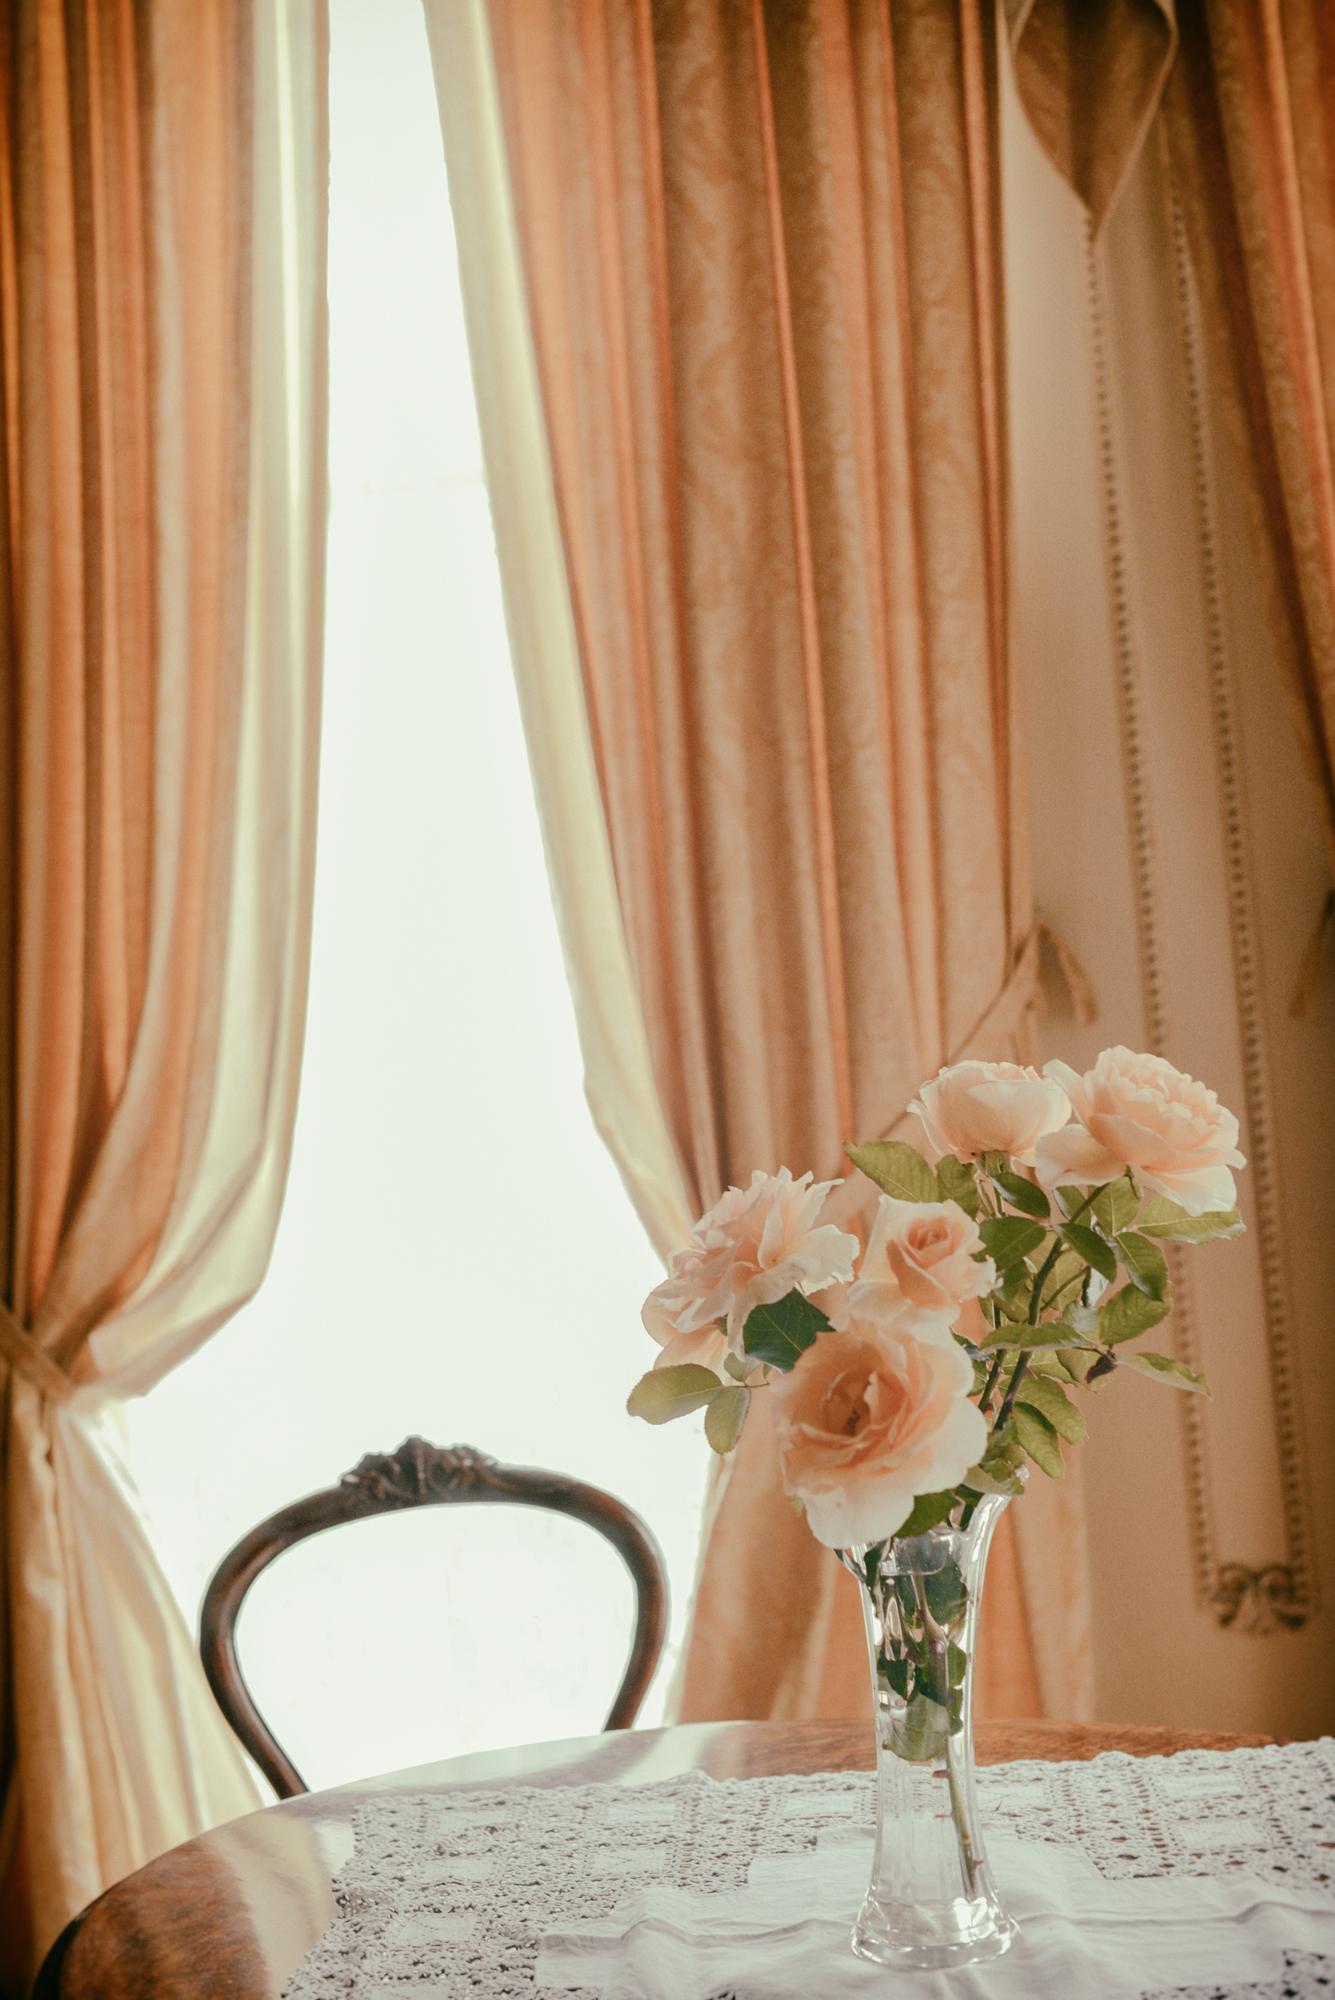 Apricot-room-1s.jpg